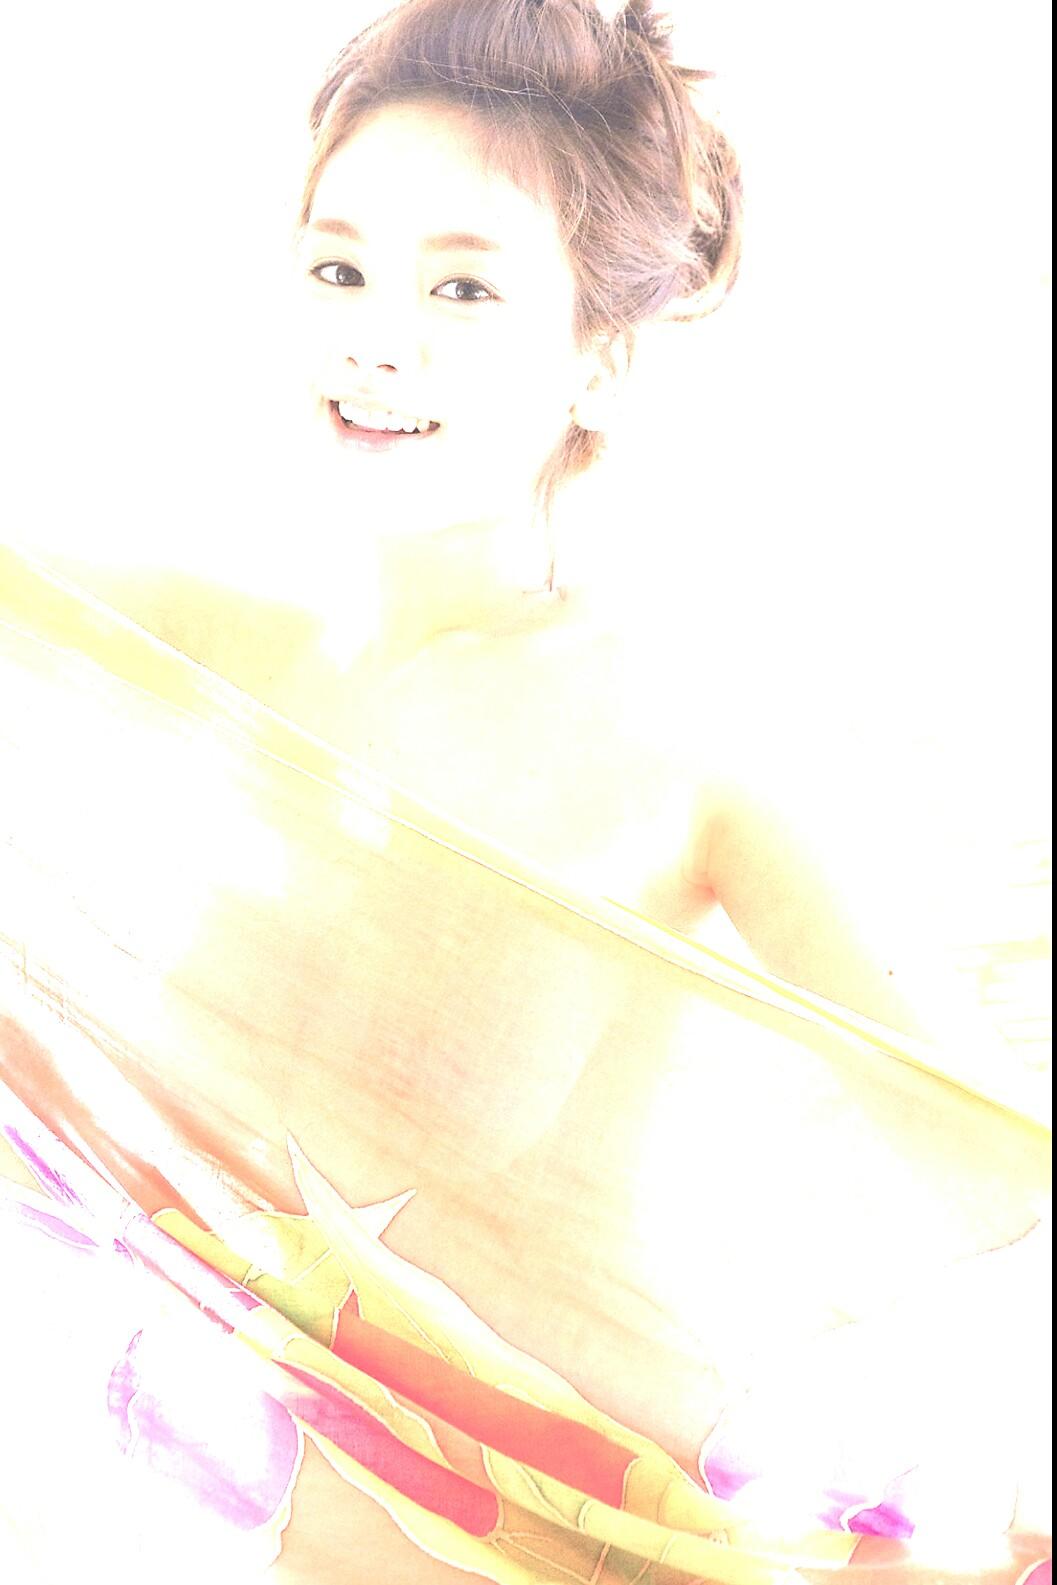 【おっぱいネキ】筧美和子さんの乳輪を隠す為の二プレスのサイズwwwwwwwwwwwwwwwwwwwwwwwww(画像あり)・15枚目